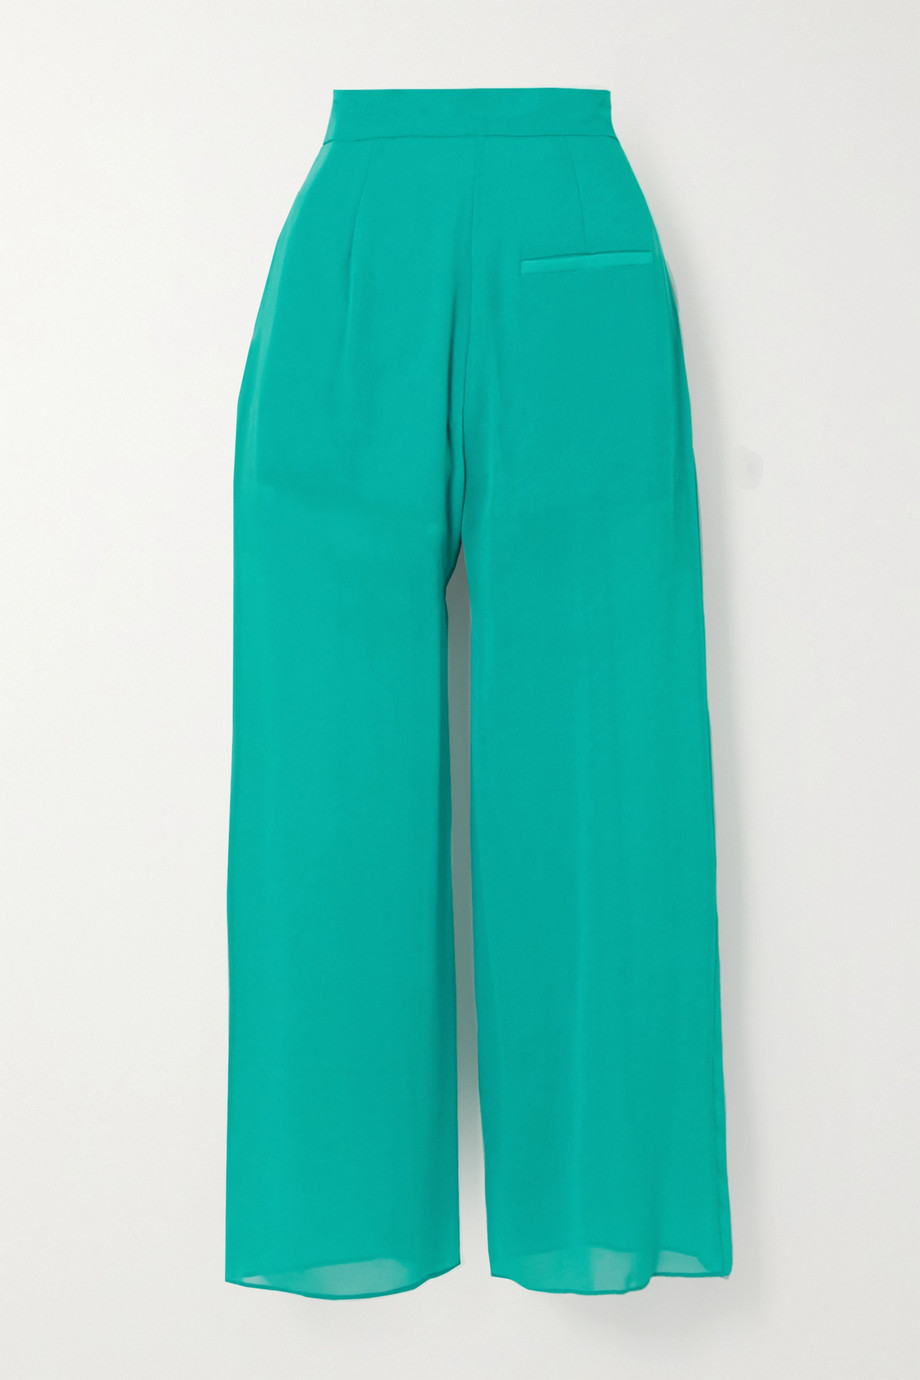 Fleur du Mal Margo lace-trimmed silk-chiffon wide-leg pants